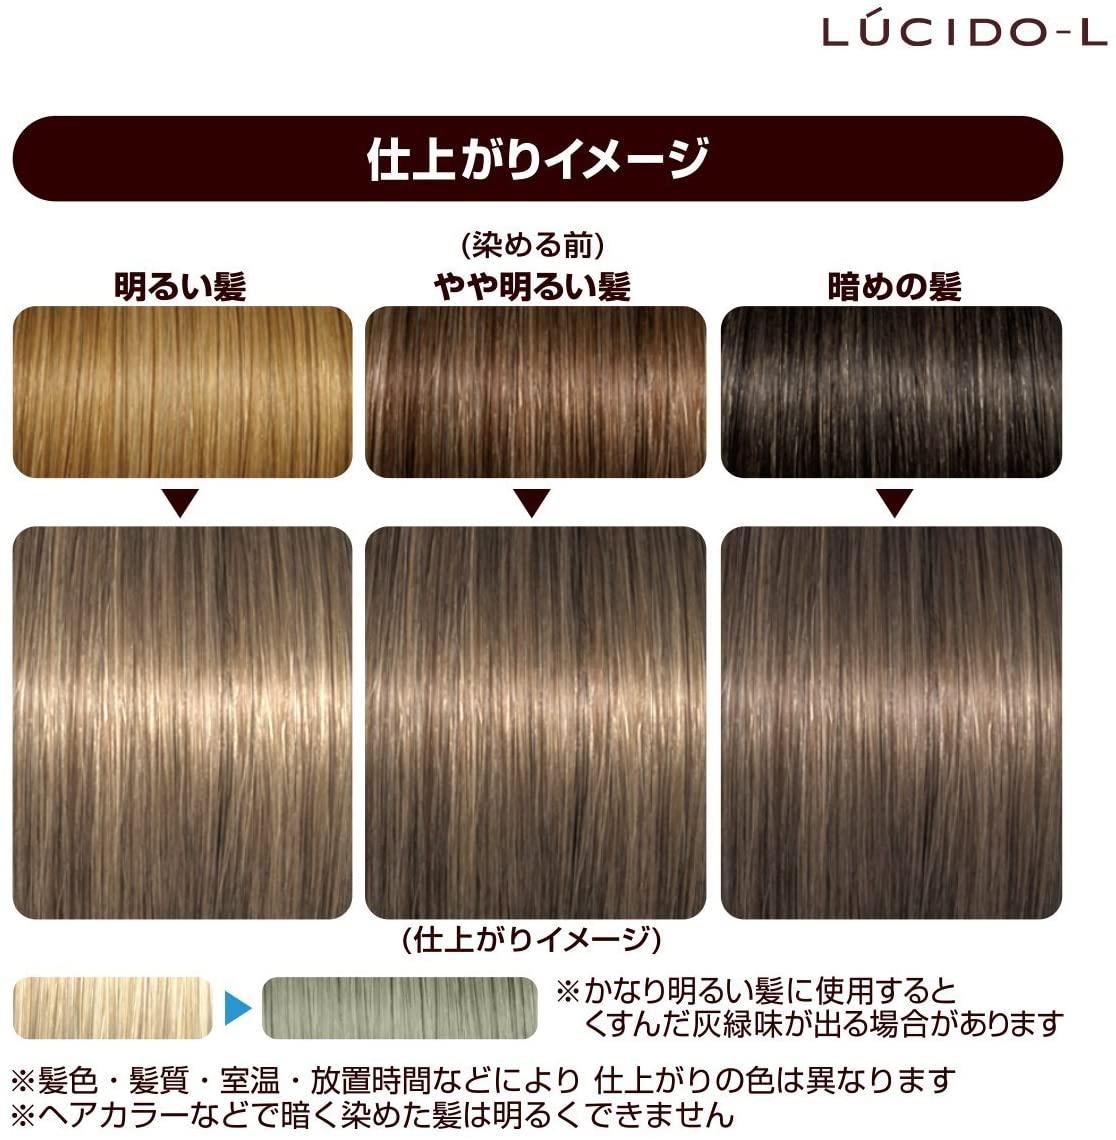 LUCIDO-L(ルシードエル) ミルクジャムヘアカラーの商品画像5